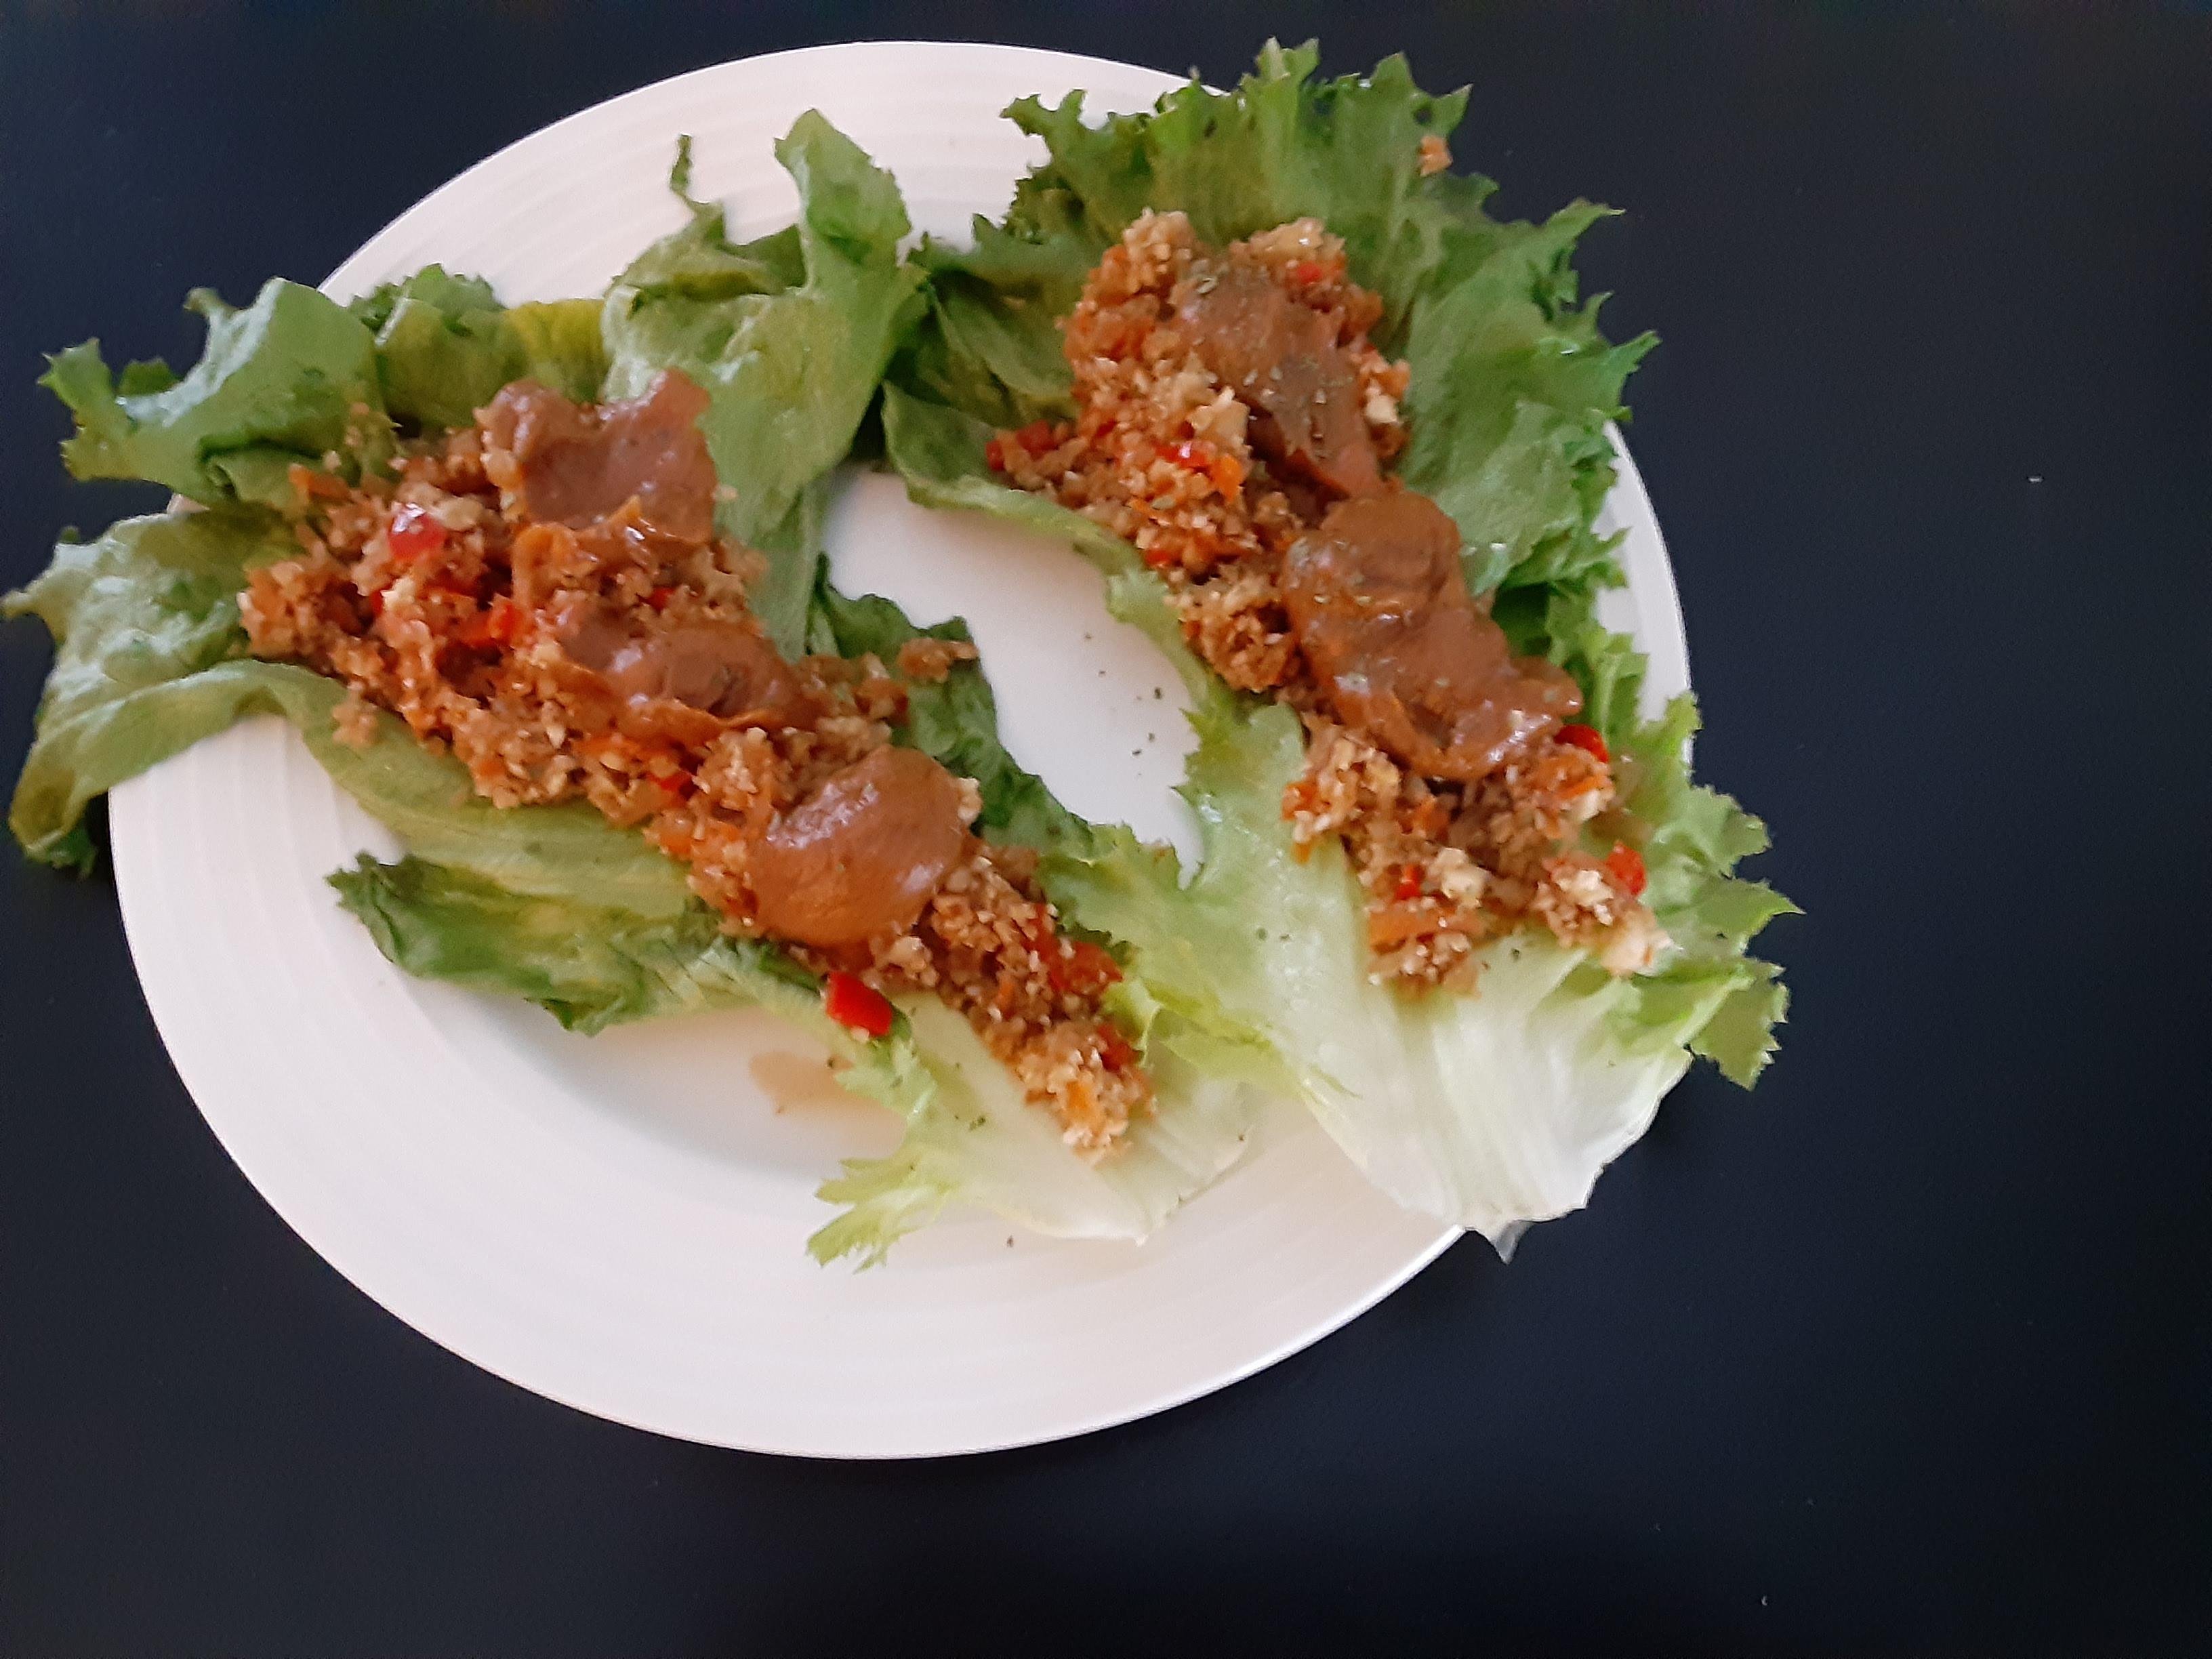 Cauliflower Rice Lettuce Wraps with Spicy Peanut Sauce bfr610